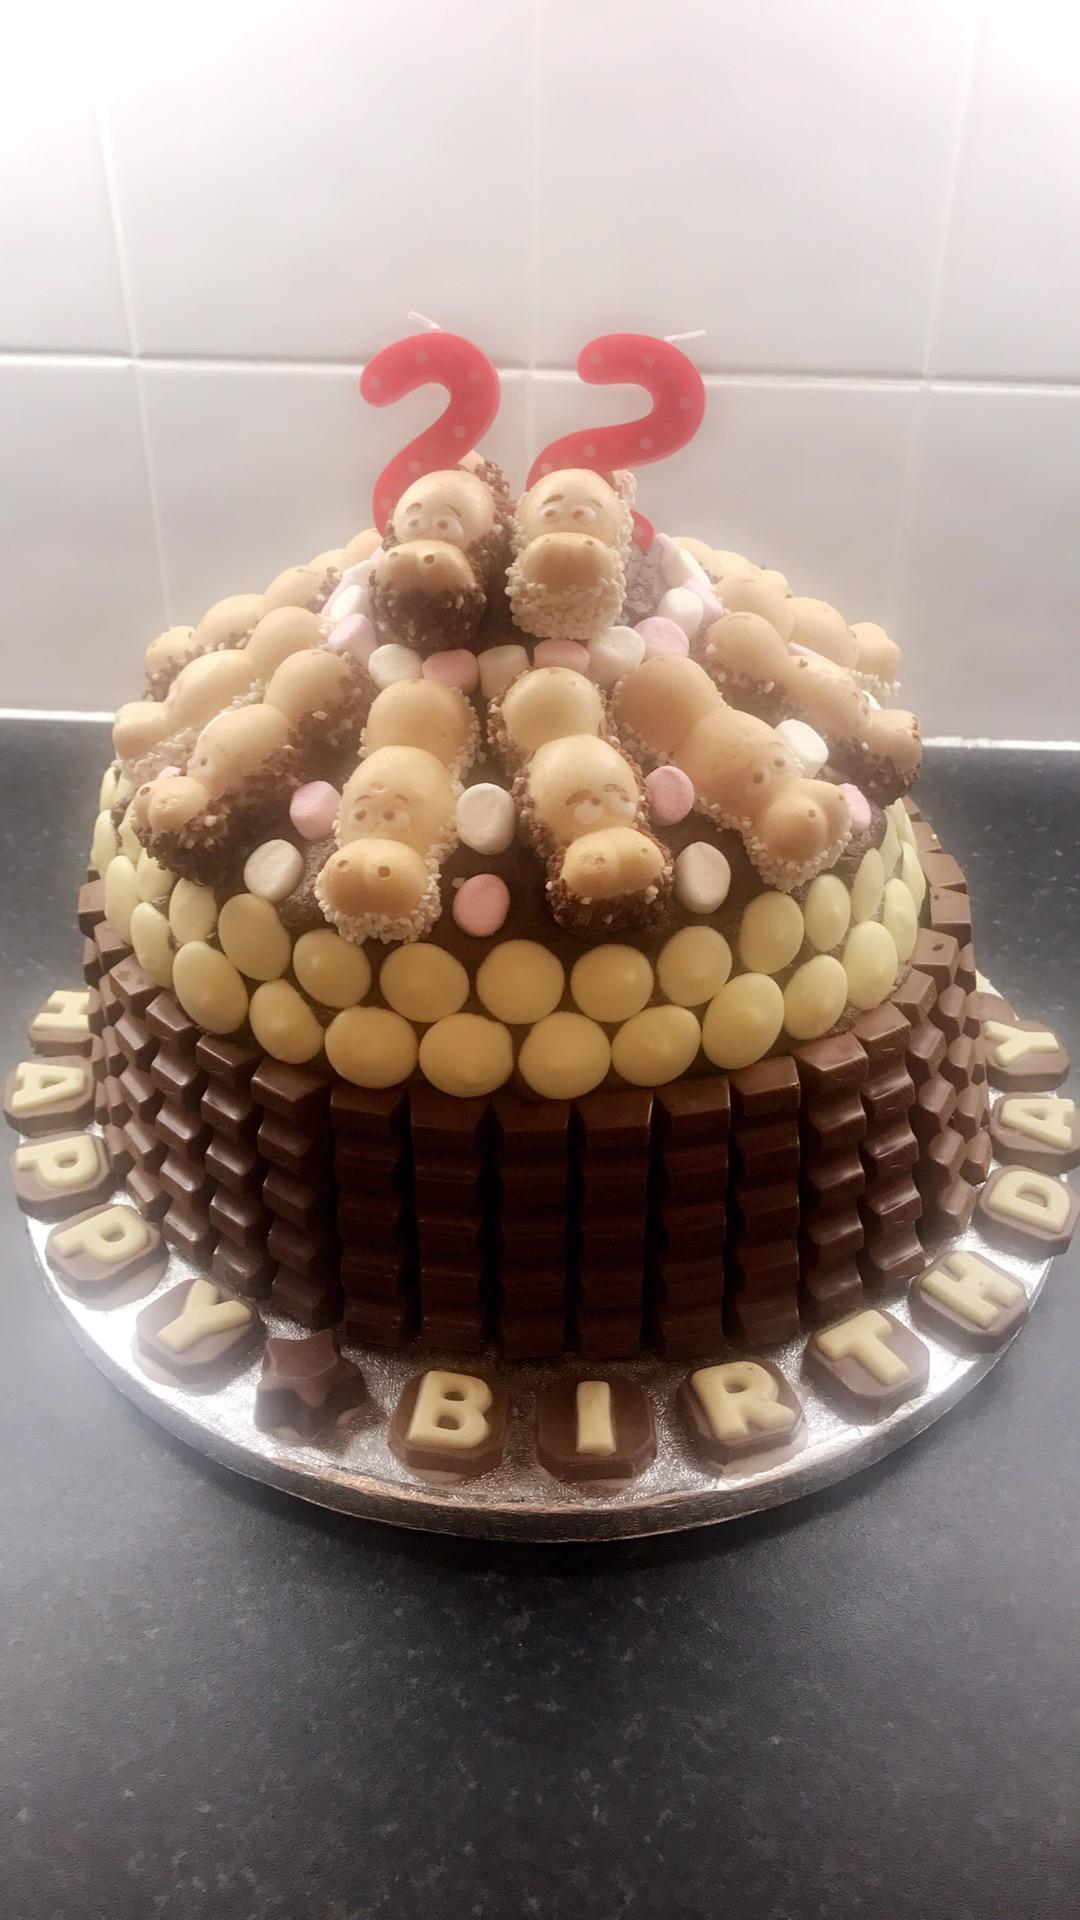 Happy Home Baking Chocolate Cake